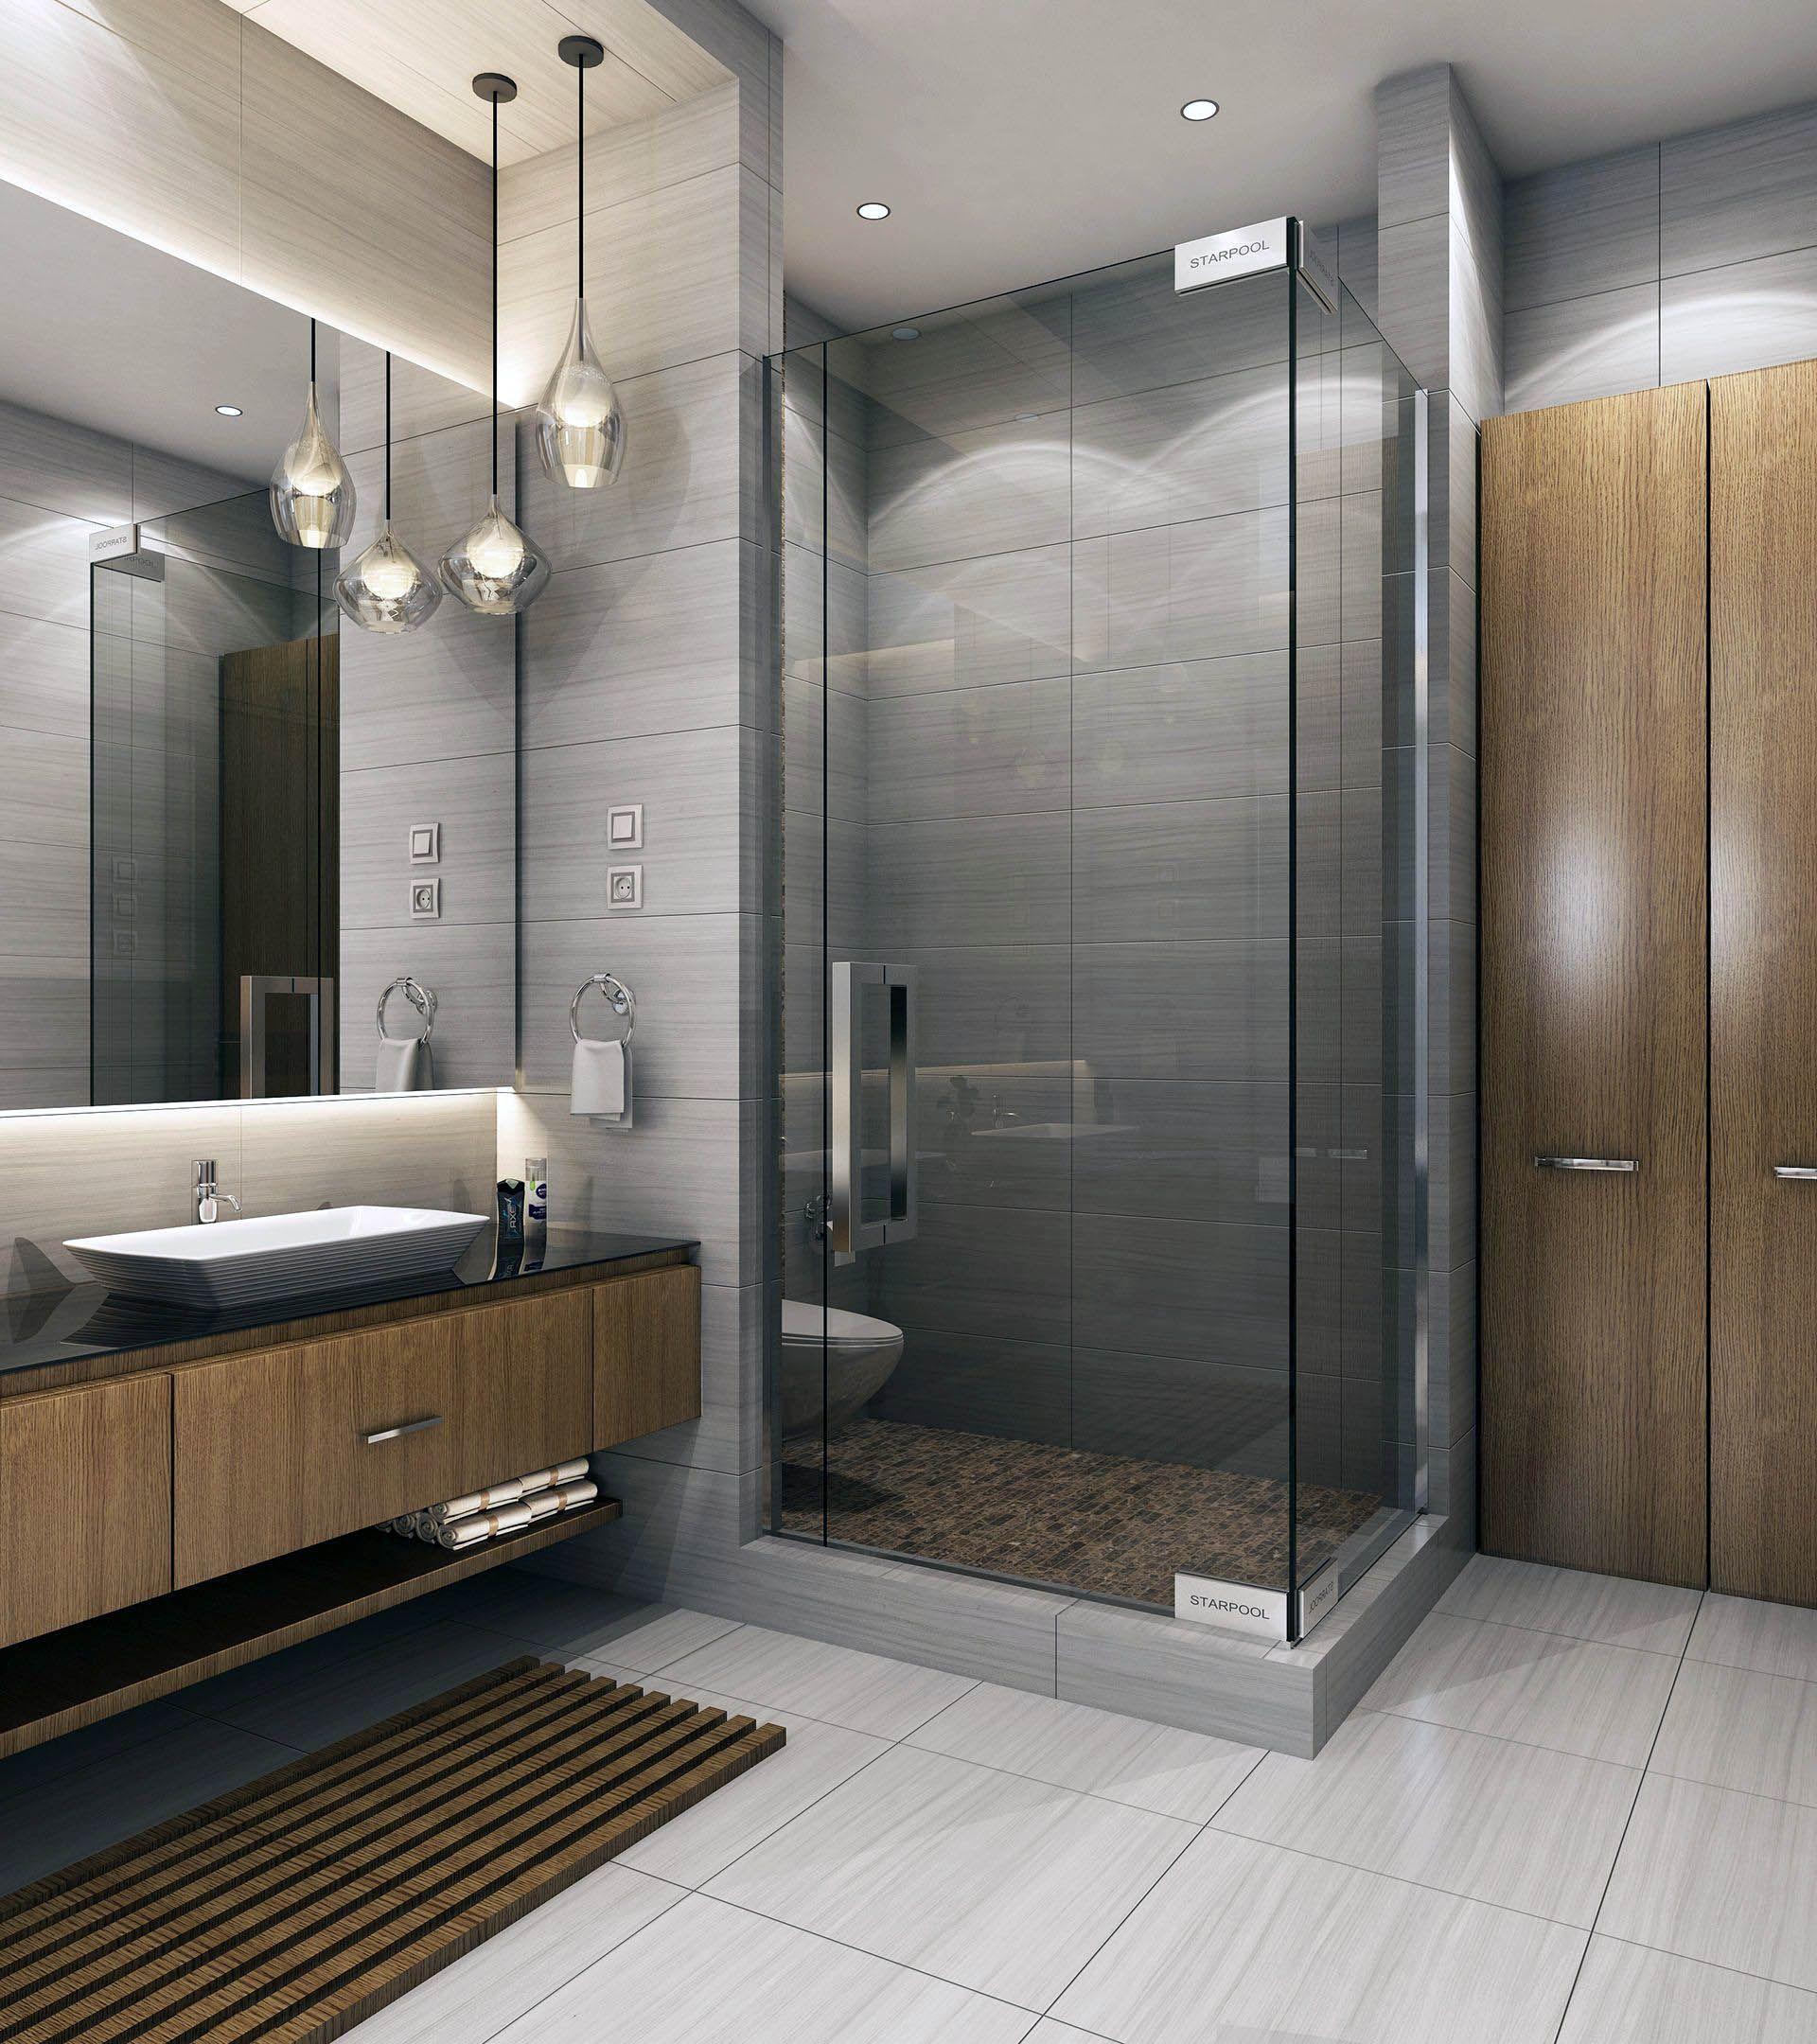 Remarkable Bathroom Cabinet Ideas Ikea Exclusive On Omahhome Com Exclusivebathroomsuk Bathroom Ideas Uk Bathroom Inspiration Modern Modern Bathroom Cabinets